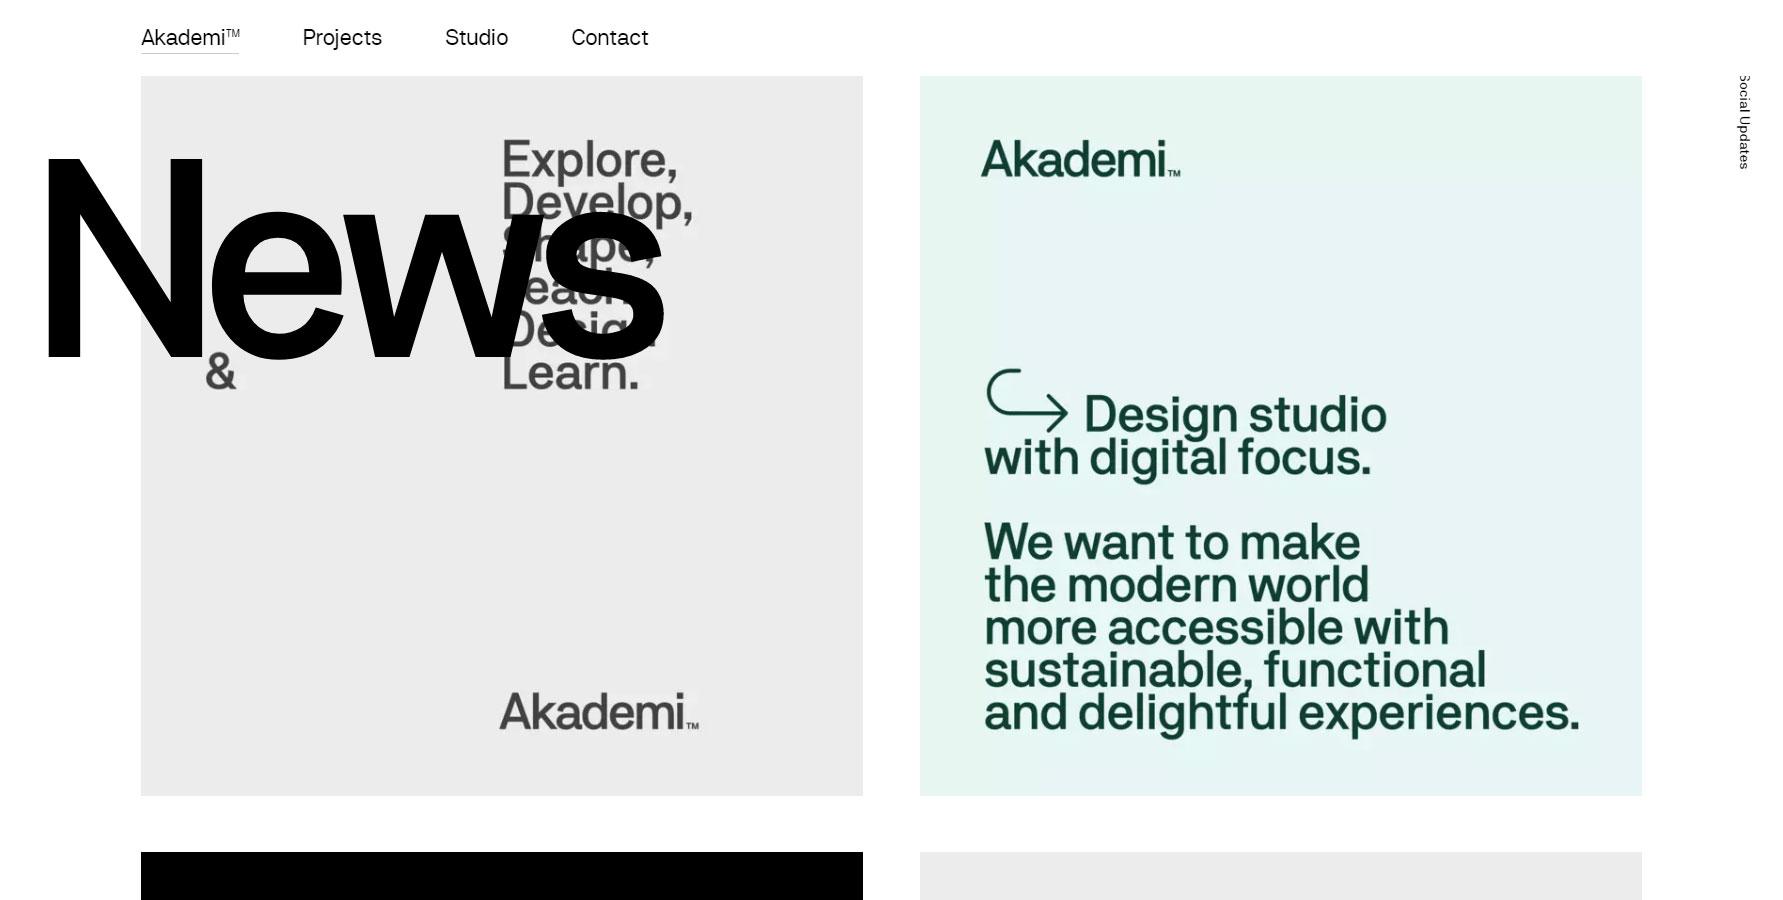 Akademi™ - Website of the Day